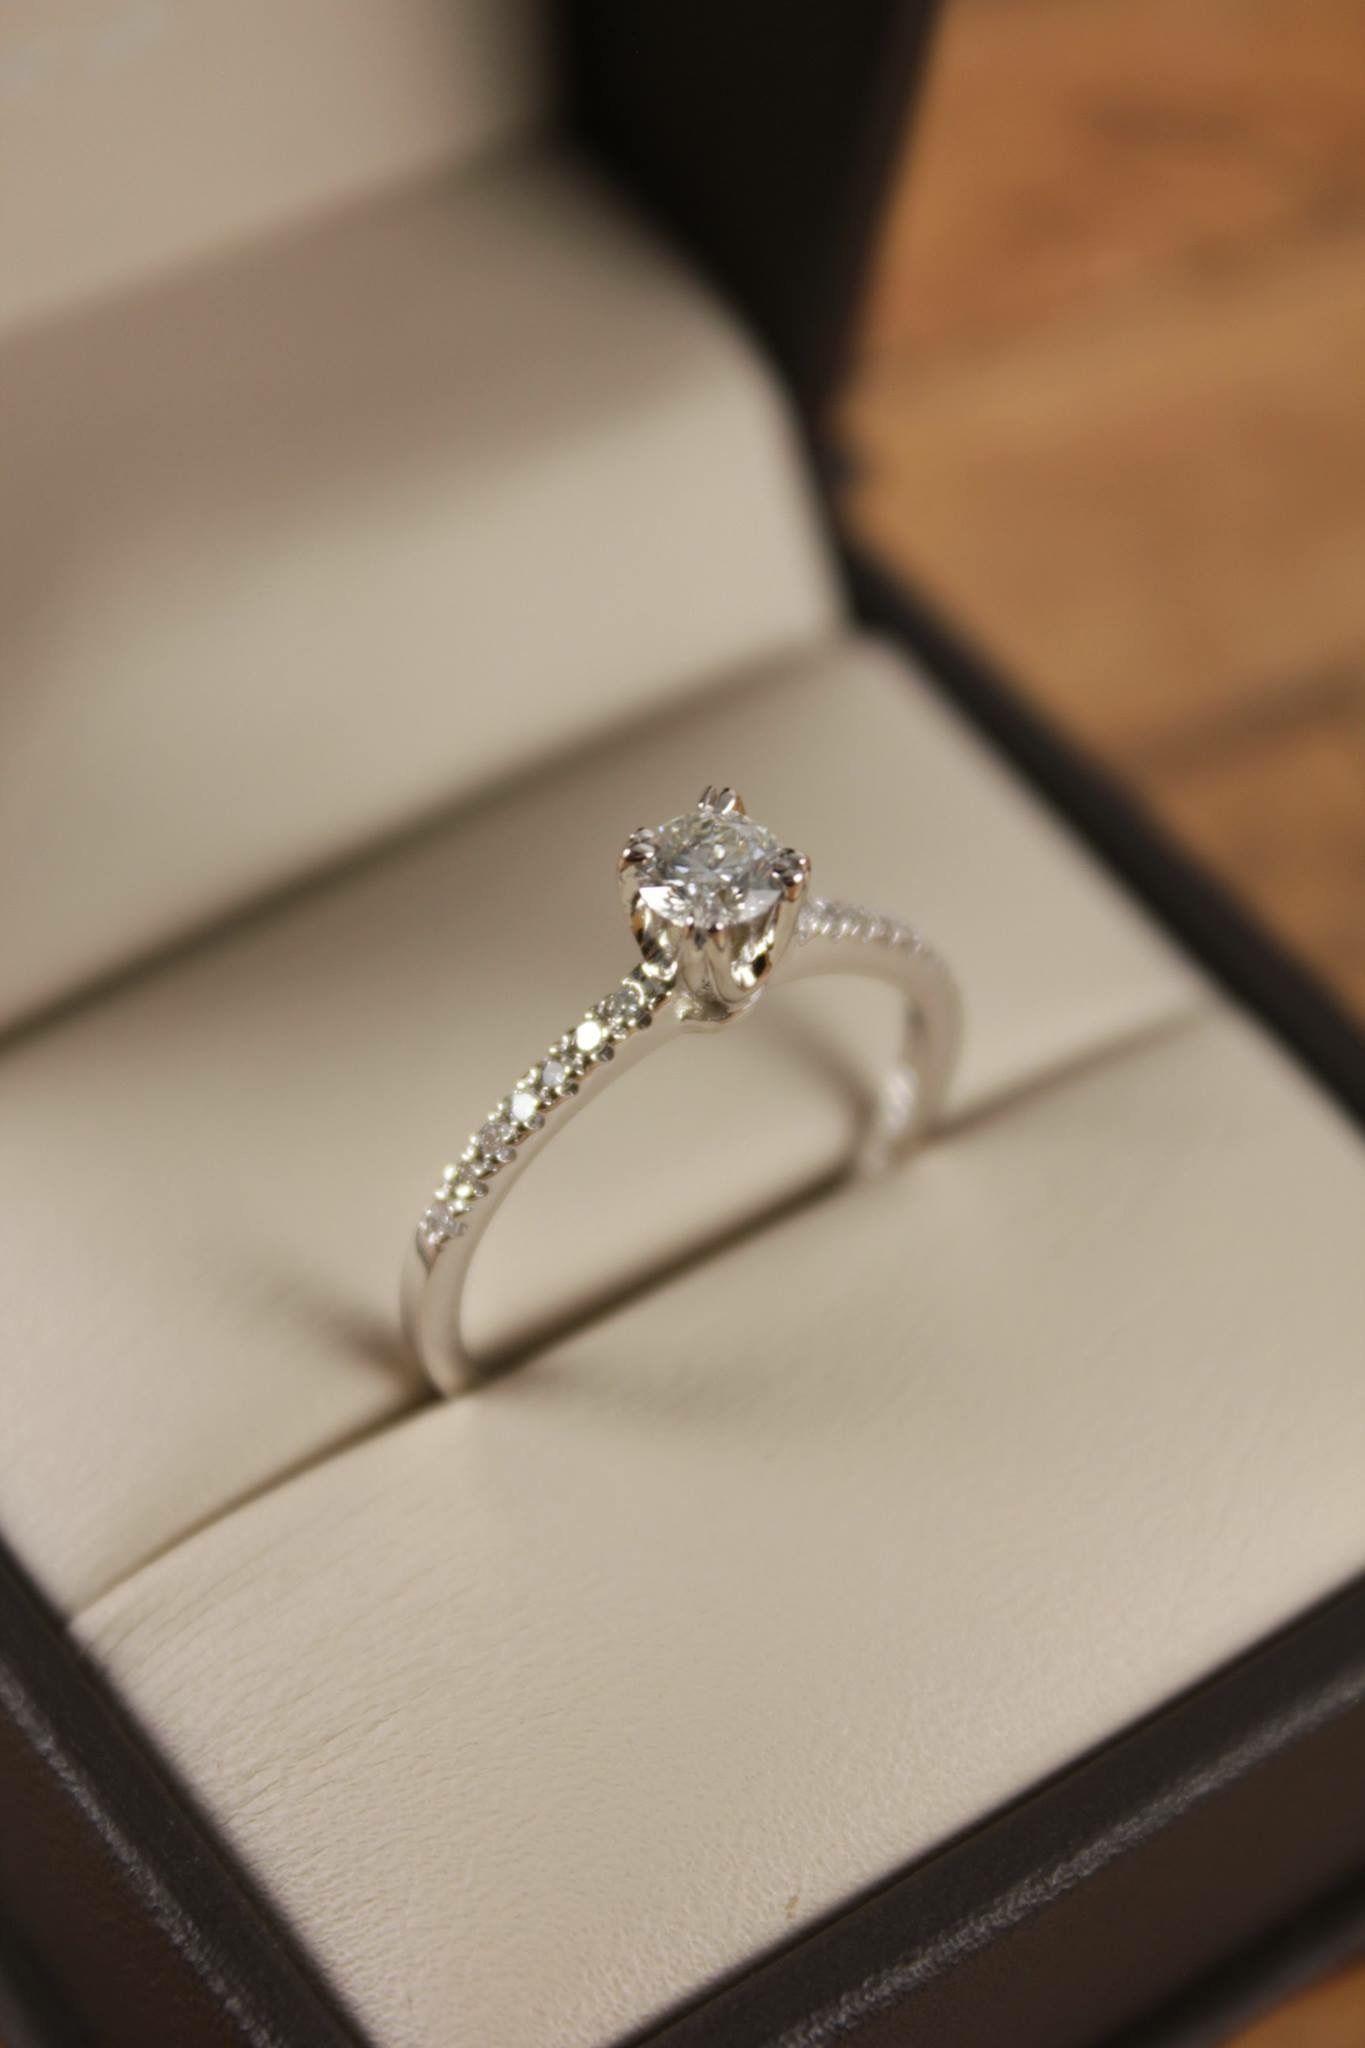 4dd69fd935f Anillo de compromiso fabricado en oro blanco con diamantes laterales ...